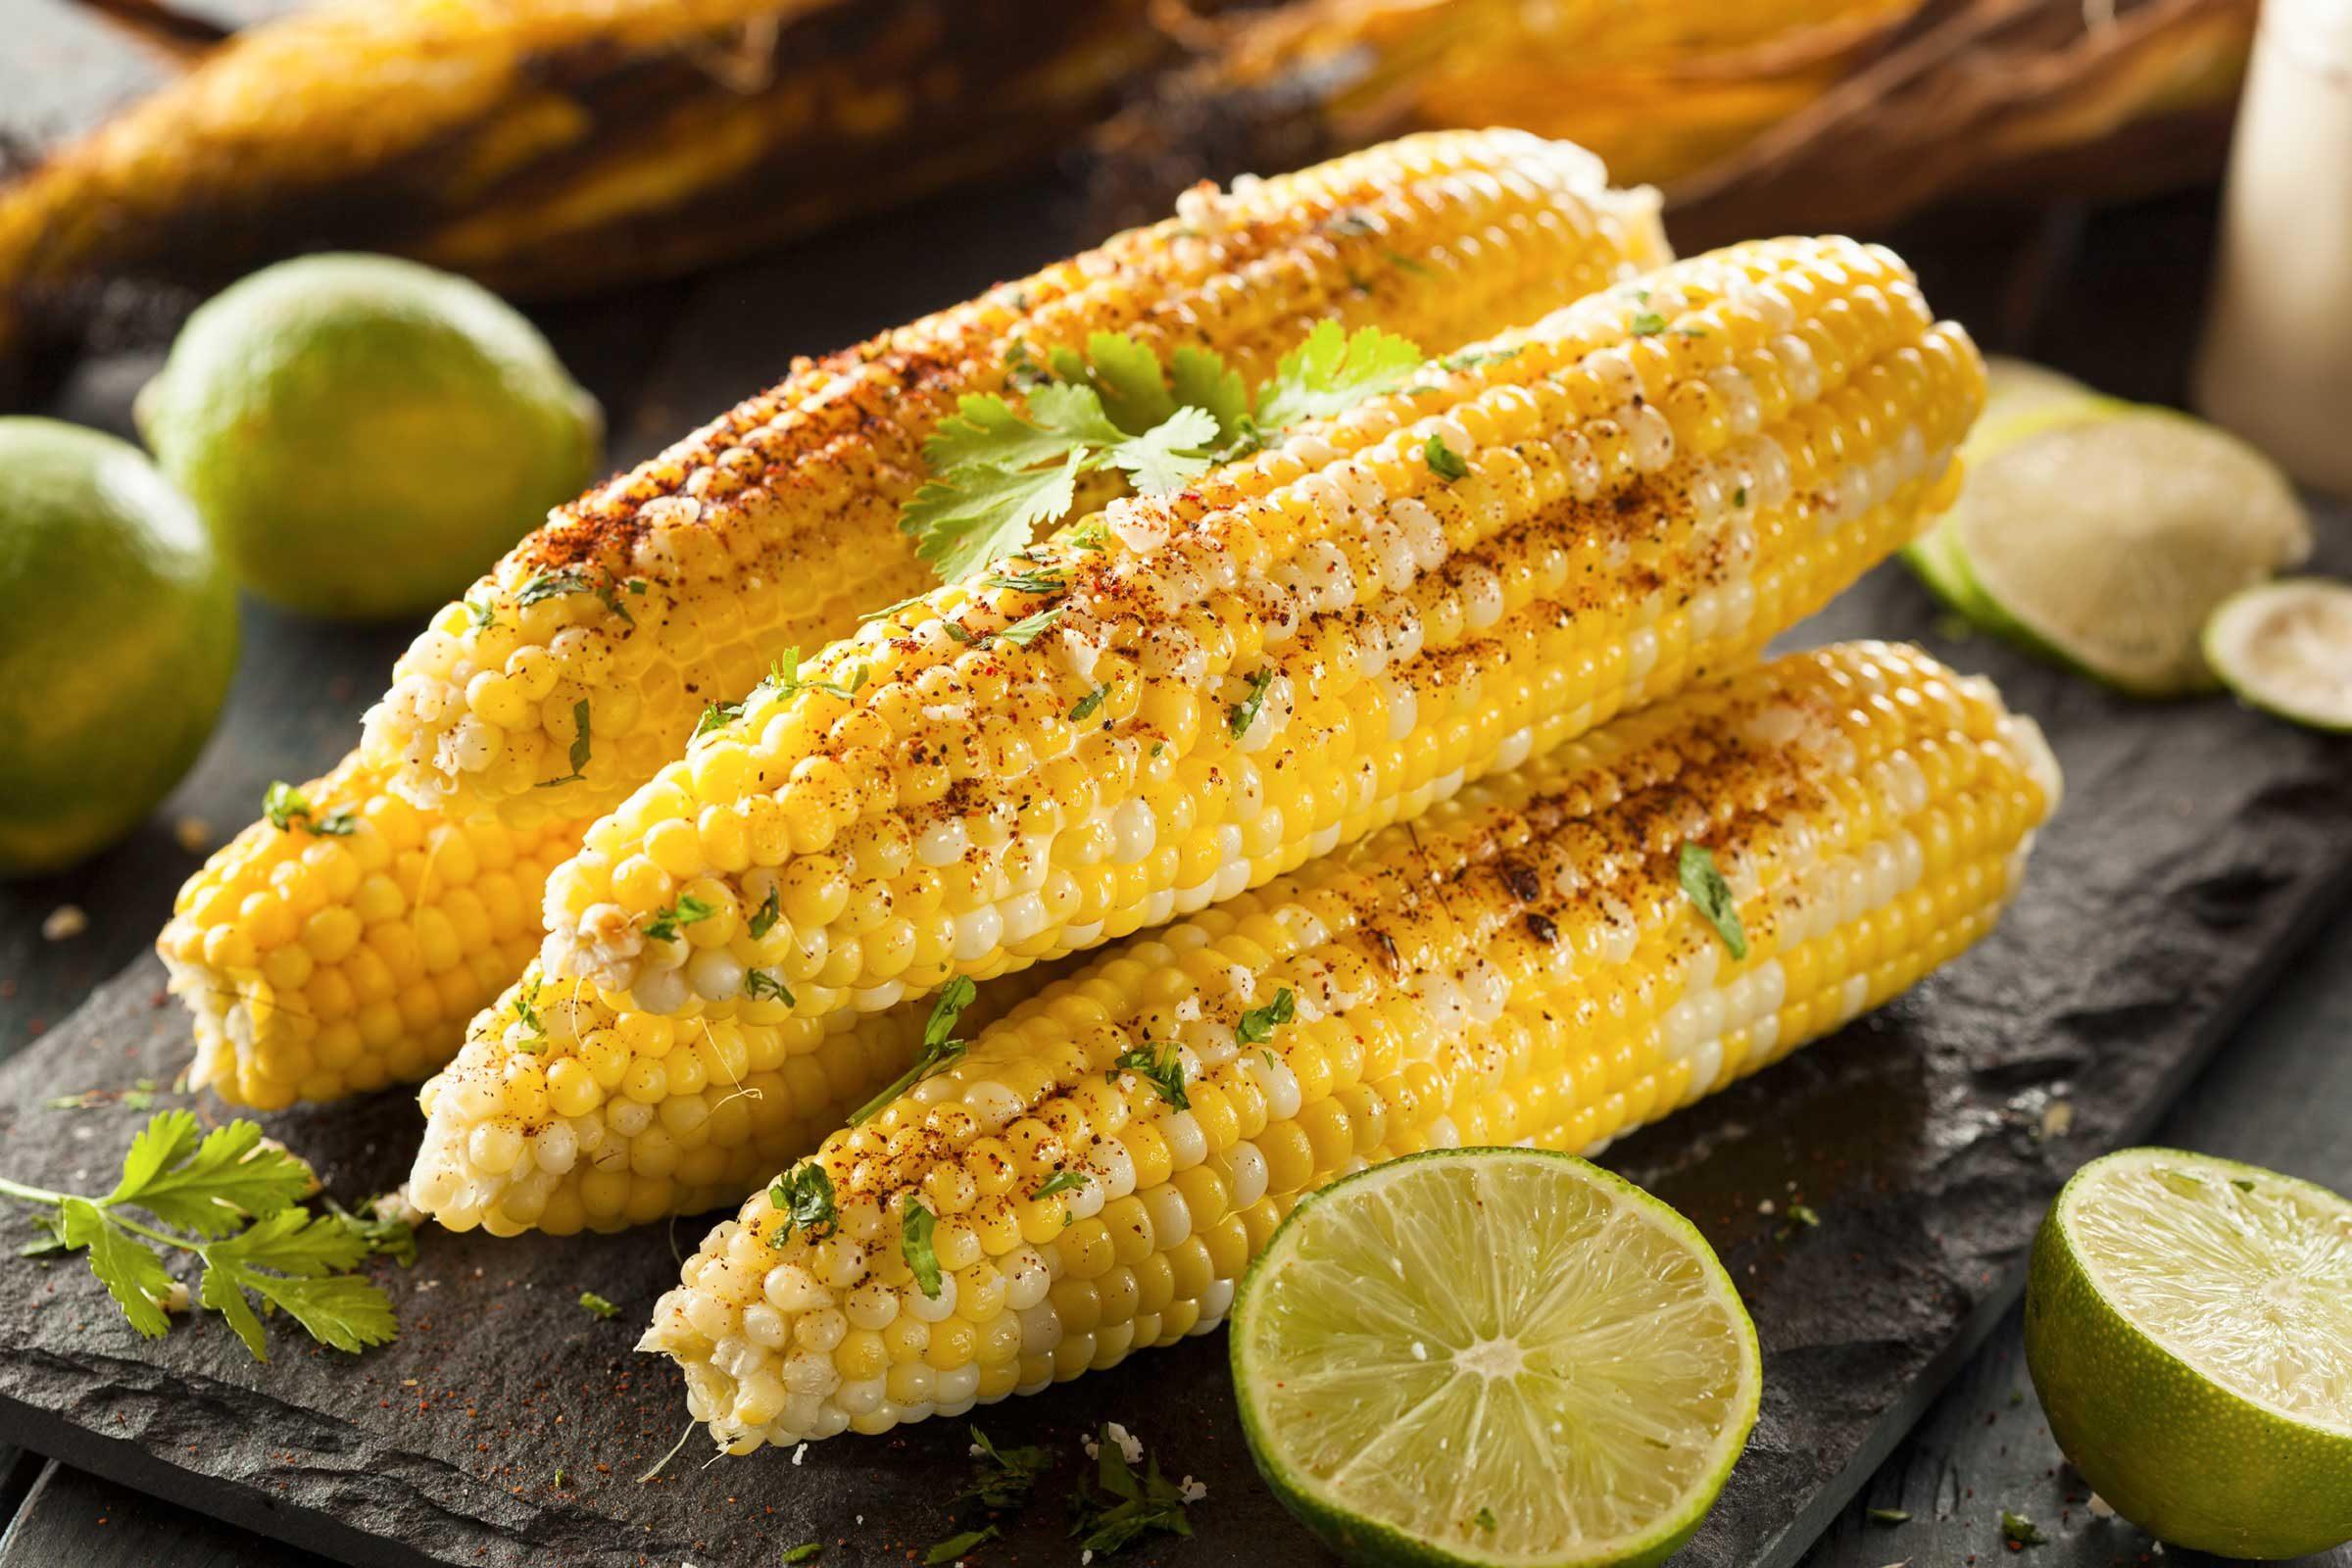 Nibble on corn